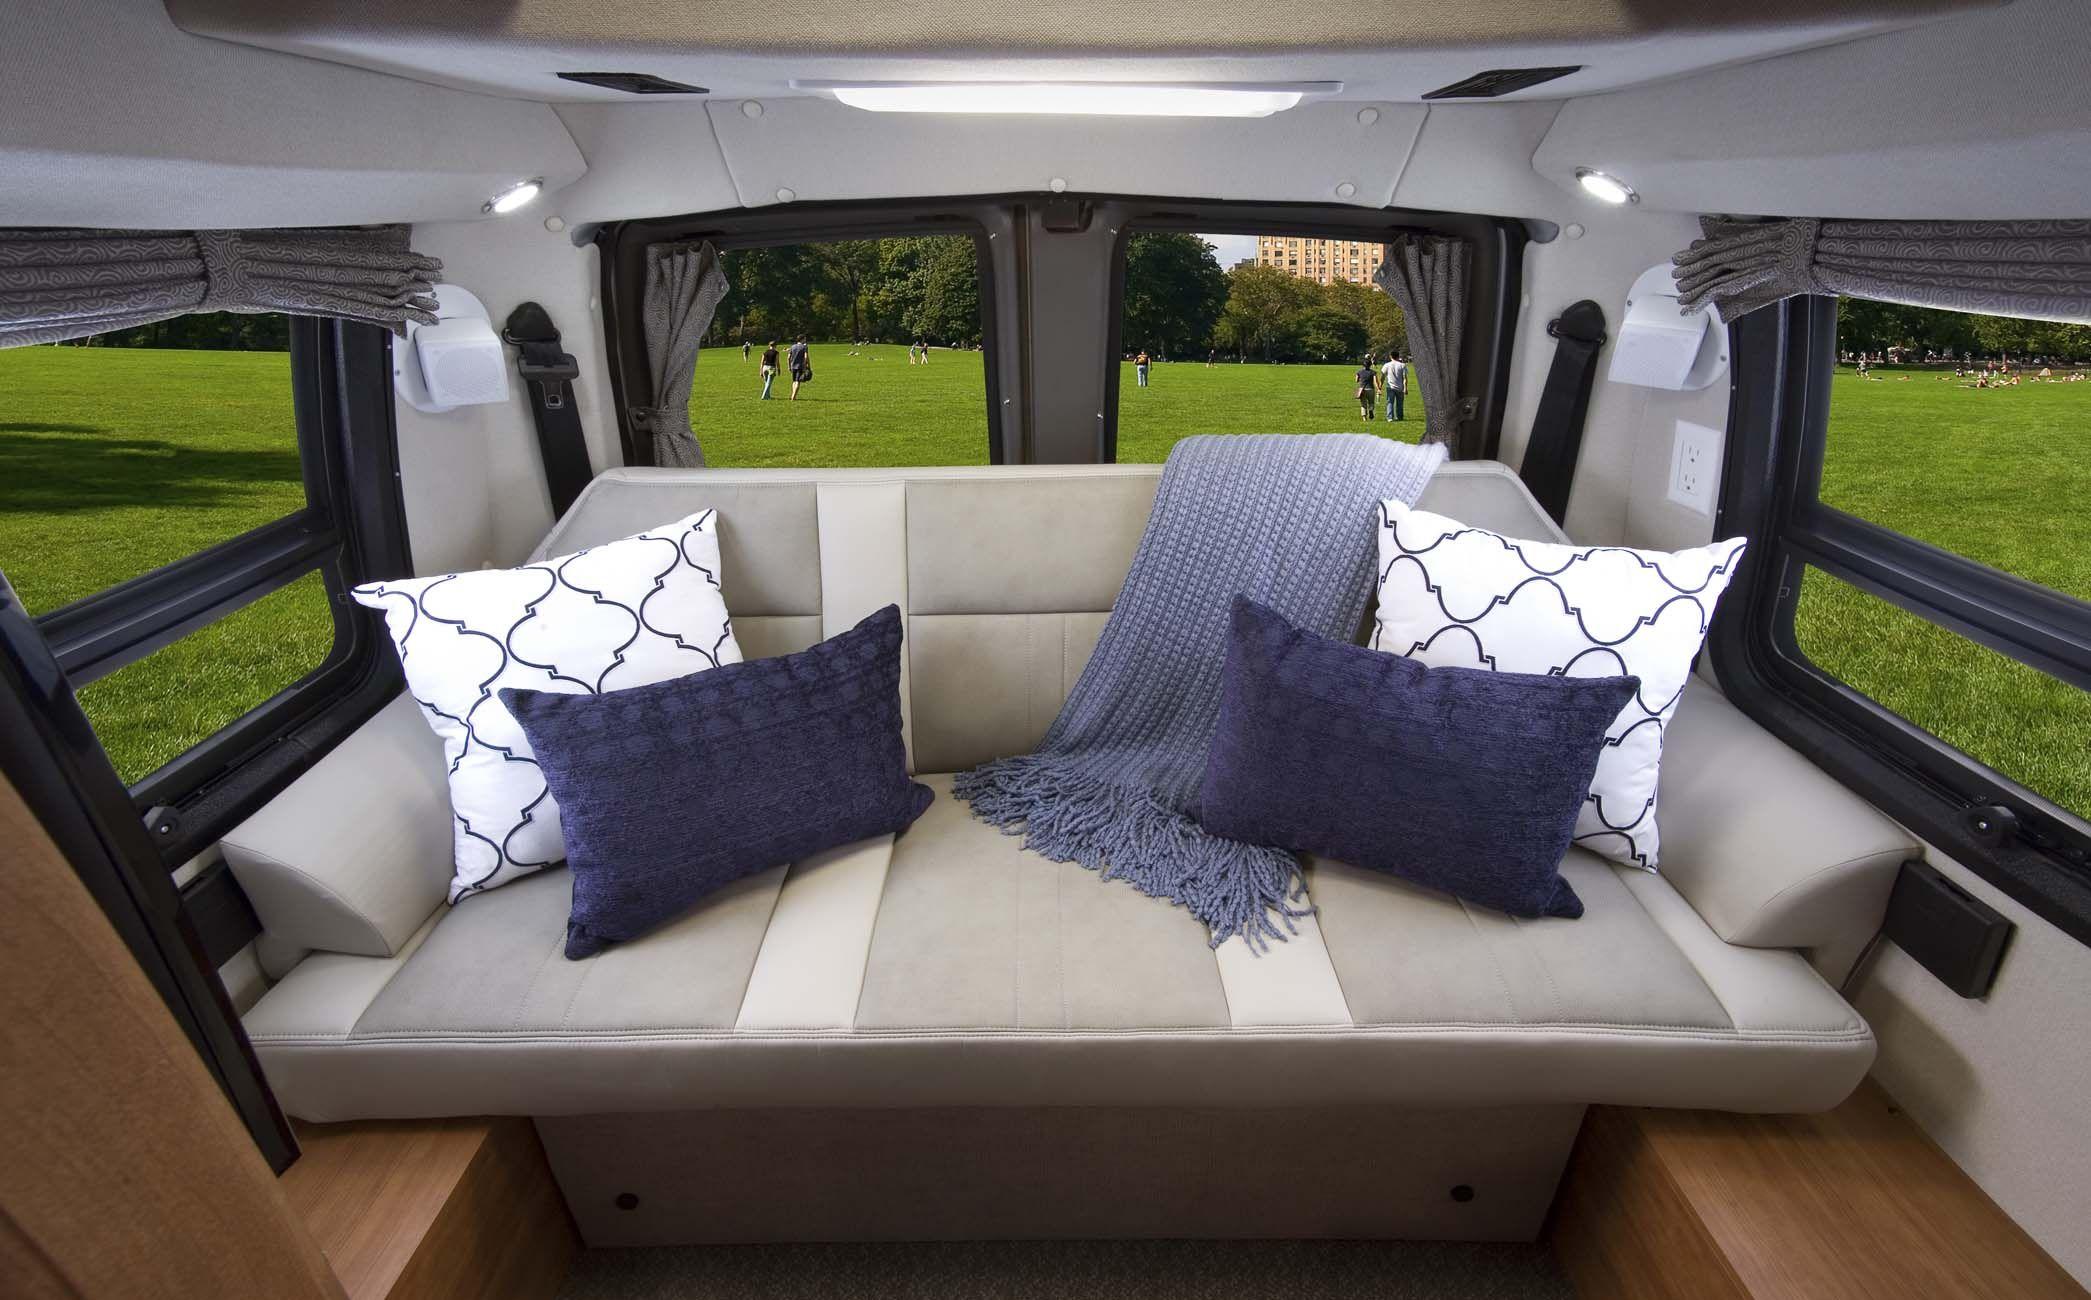 170 Versatile Interior Roadtrek, Outdoor furniture sets